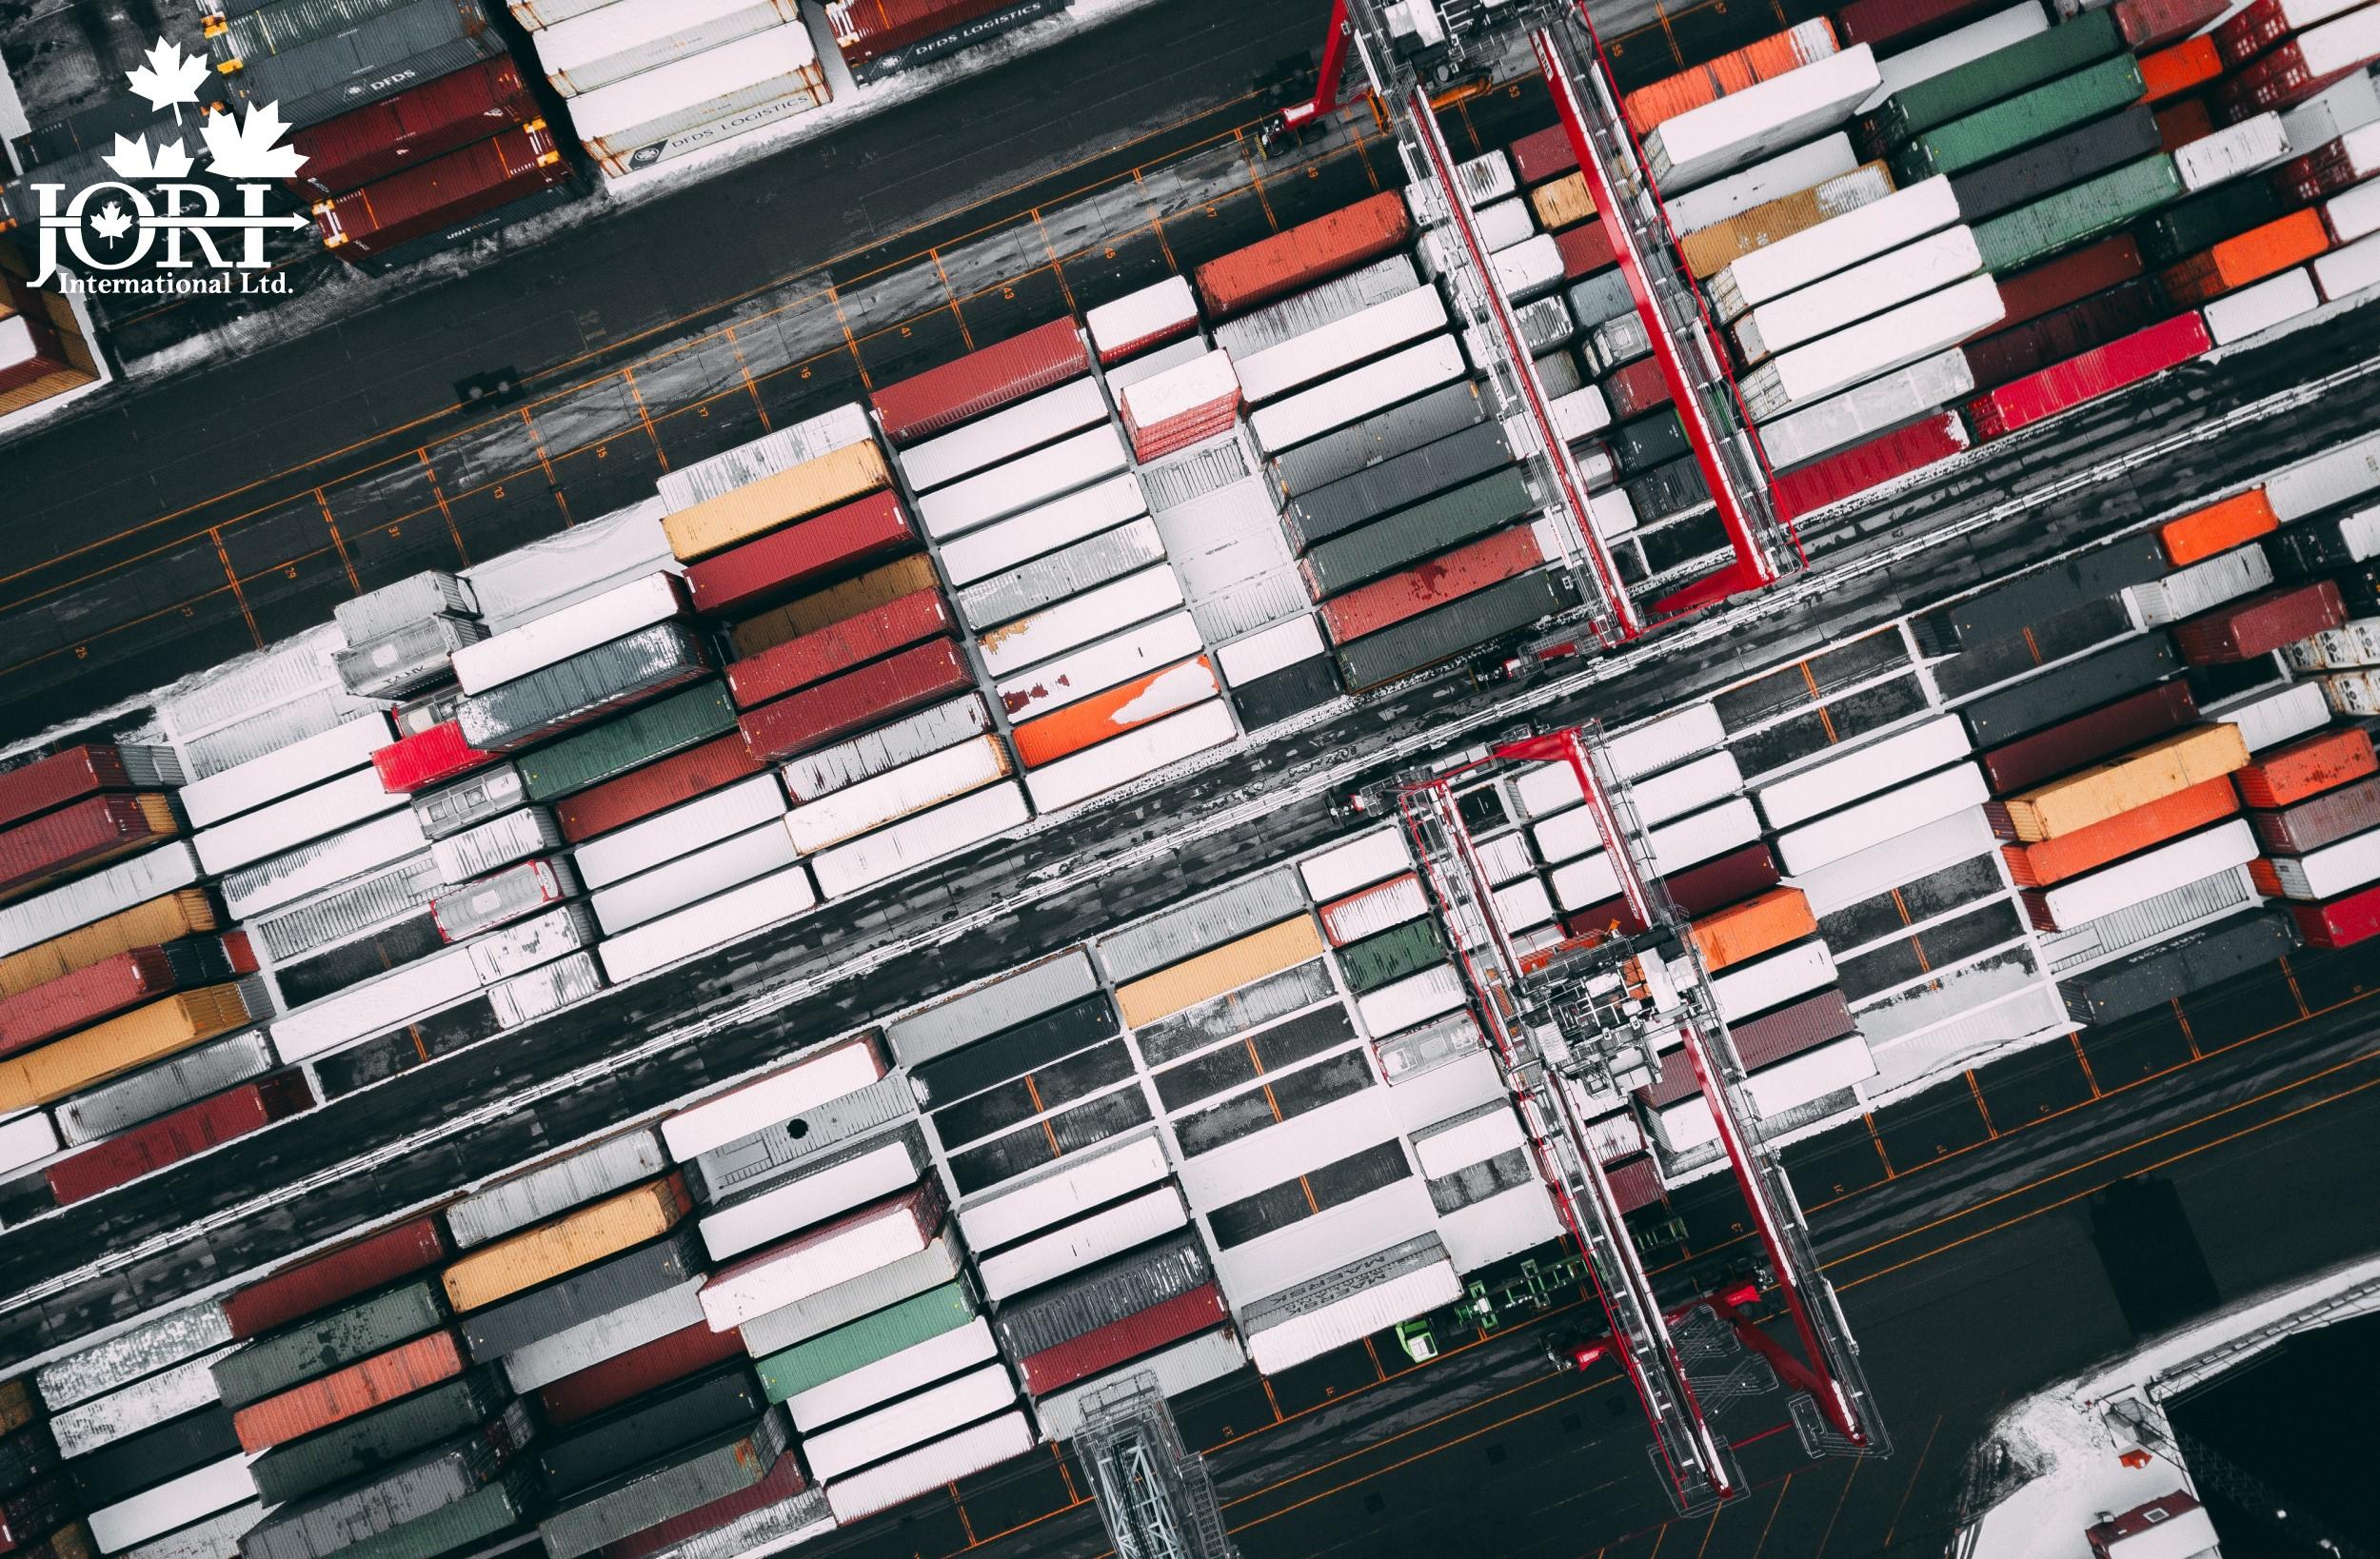 ocean-shipments-and-freight-insurance.jpg